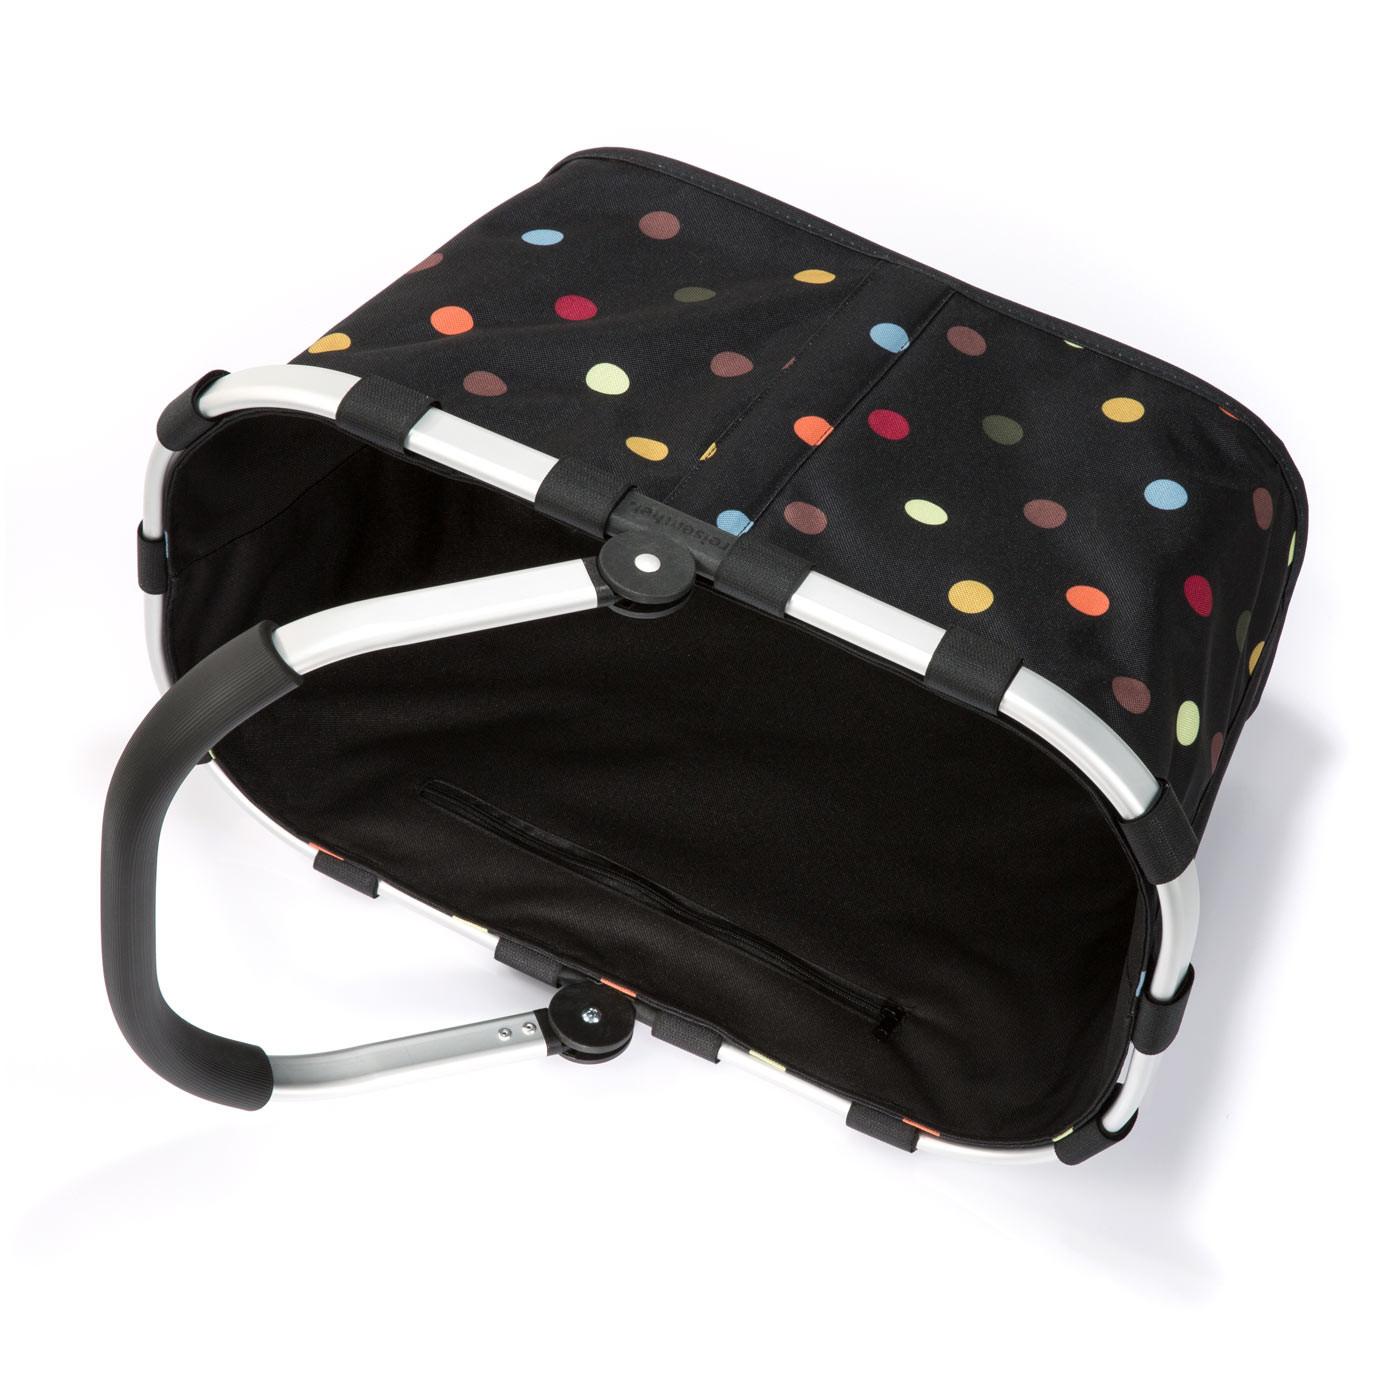 Reisenthel Carrybag 22l dots im Suhl Online Shop